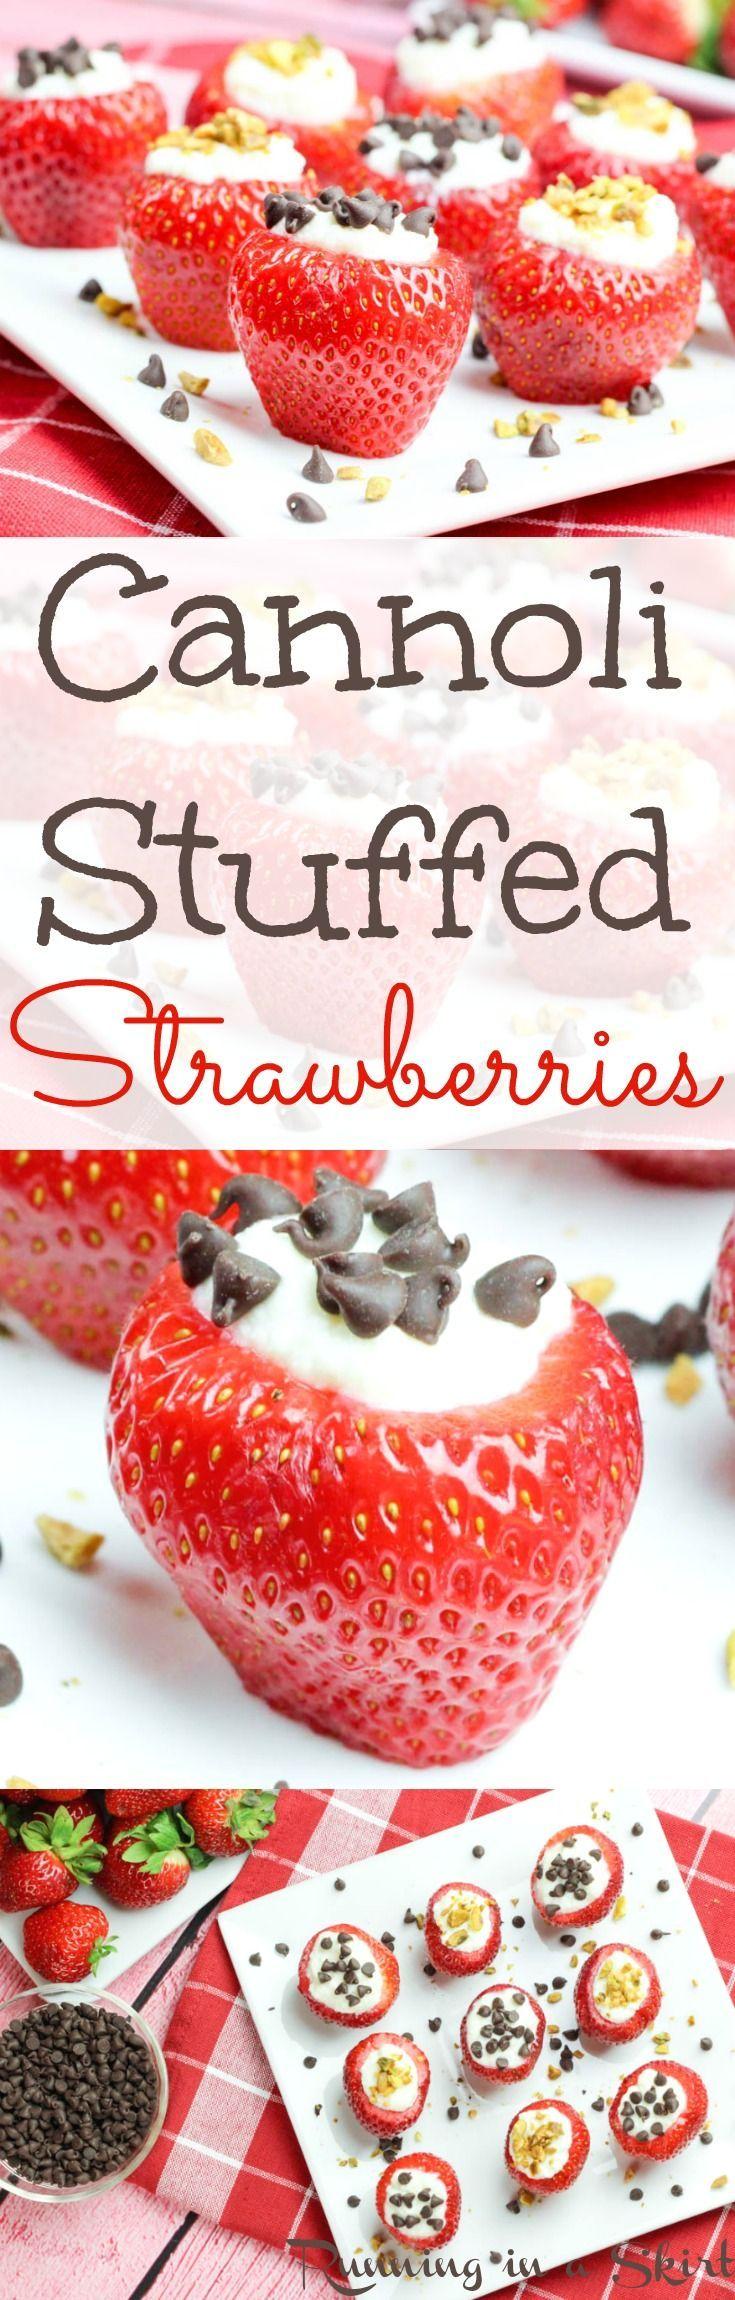 Cannoli Stuffed Strawberries Lactose Free Desserts Health Desserts Healthy Dessert Recipes